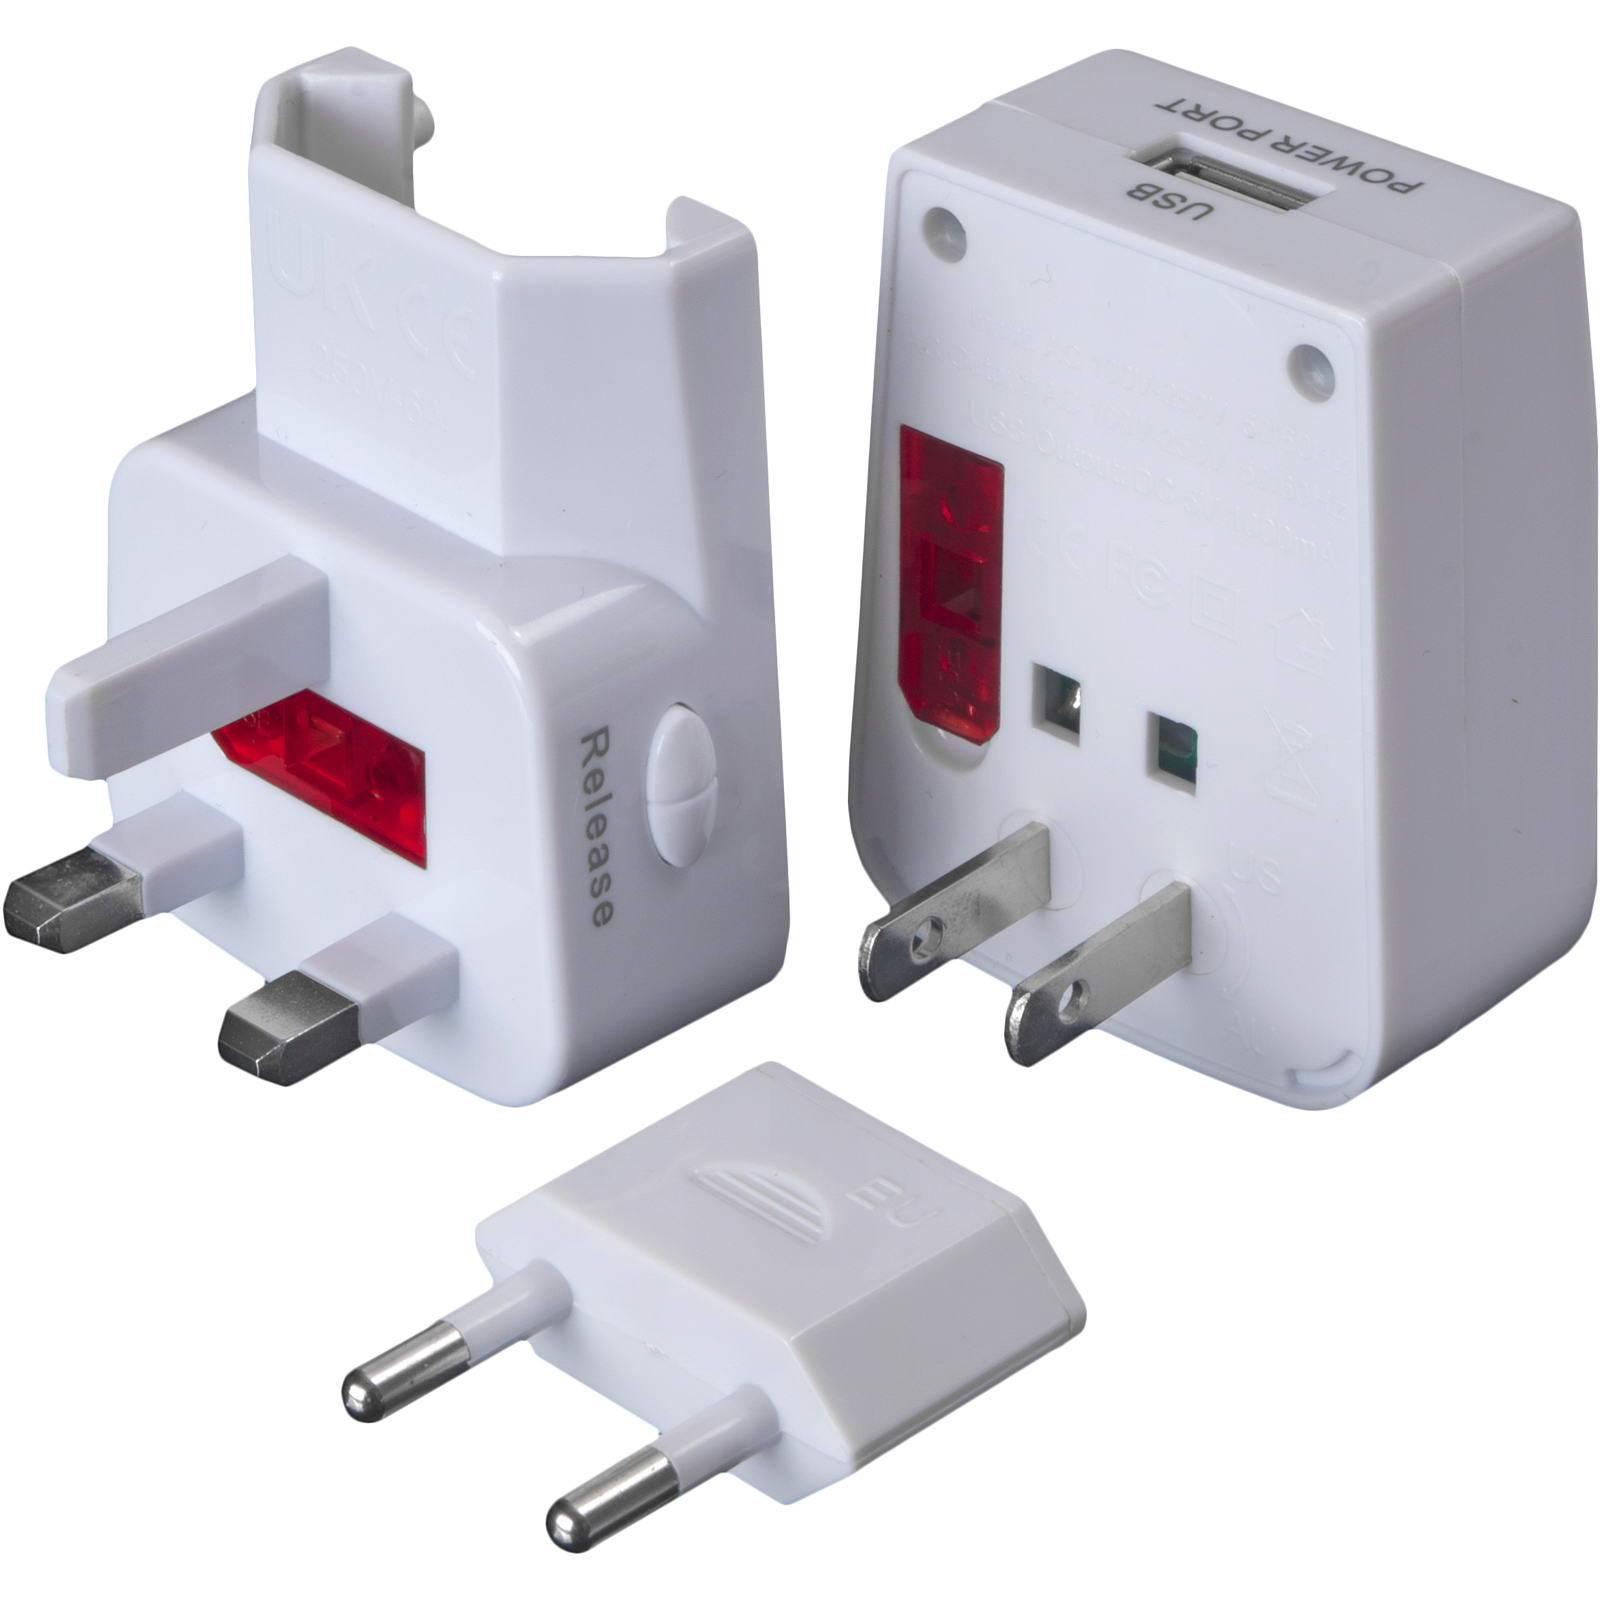 Relags Universal USB Steckeradapter - Bild 1